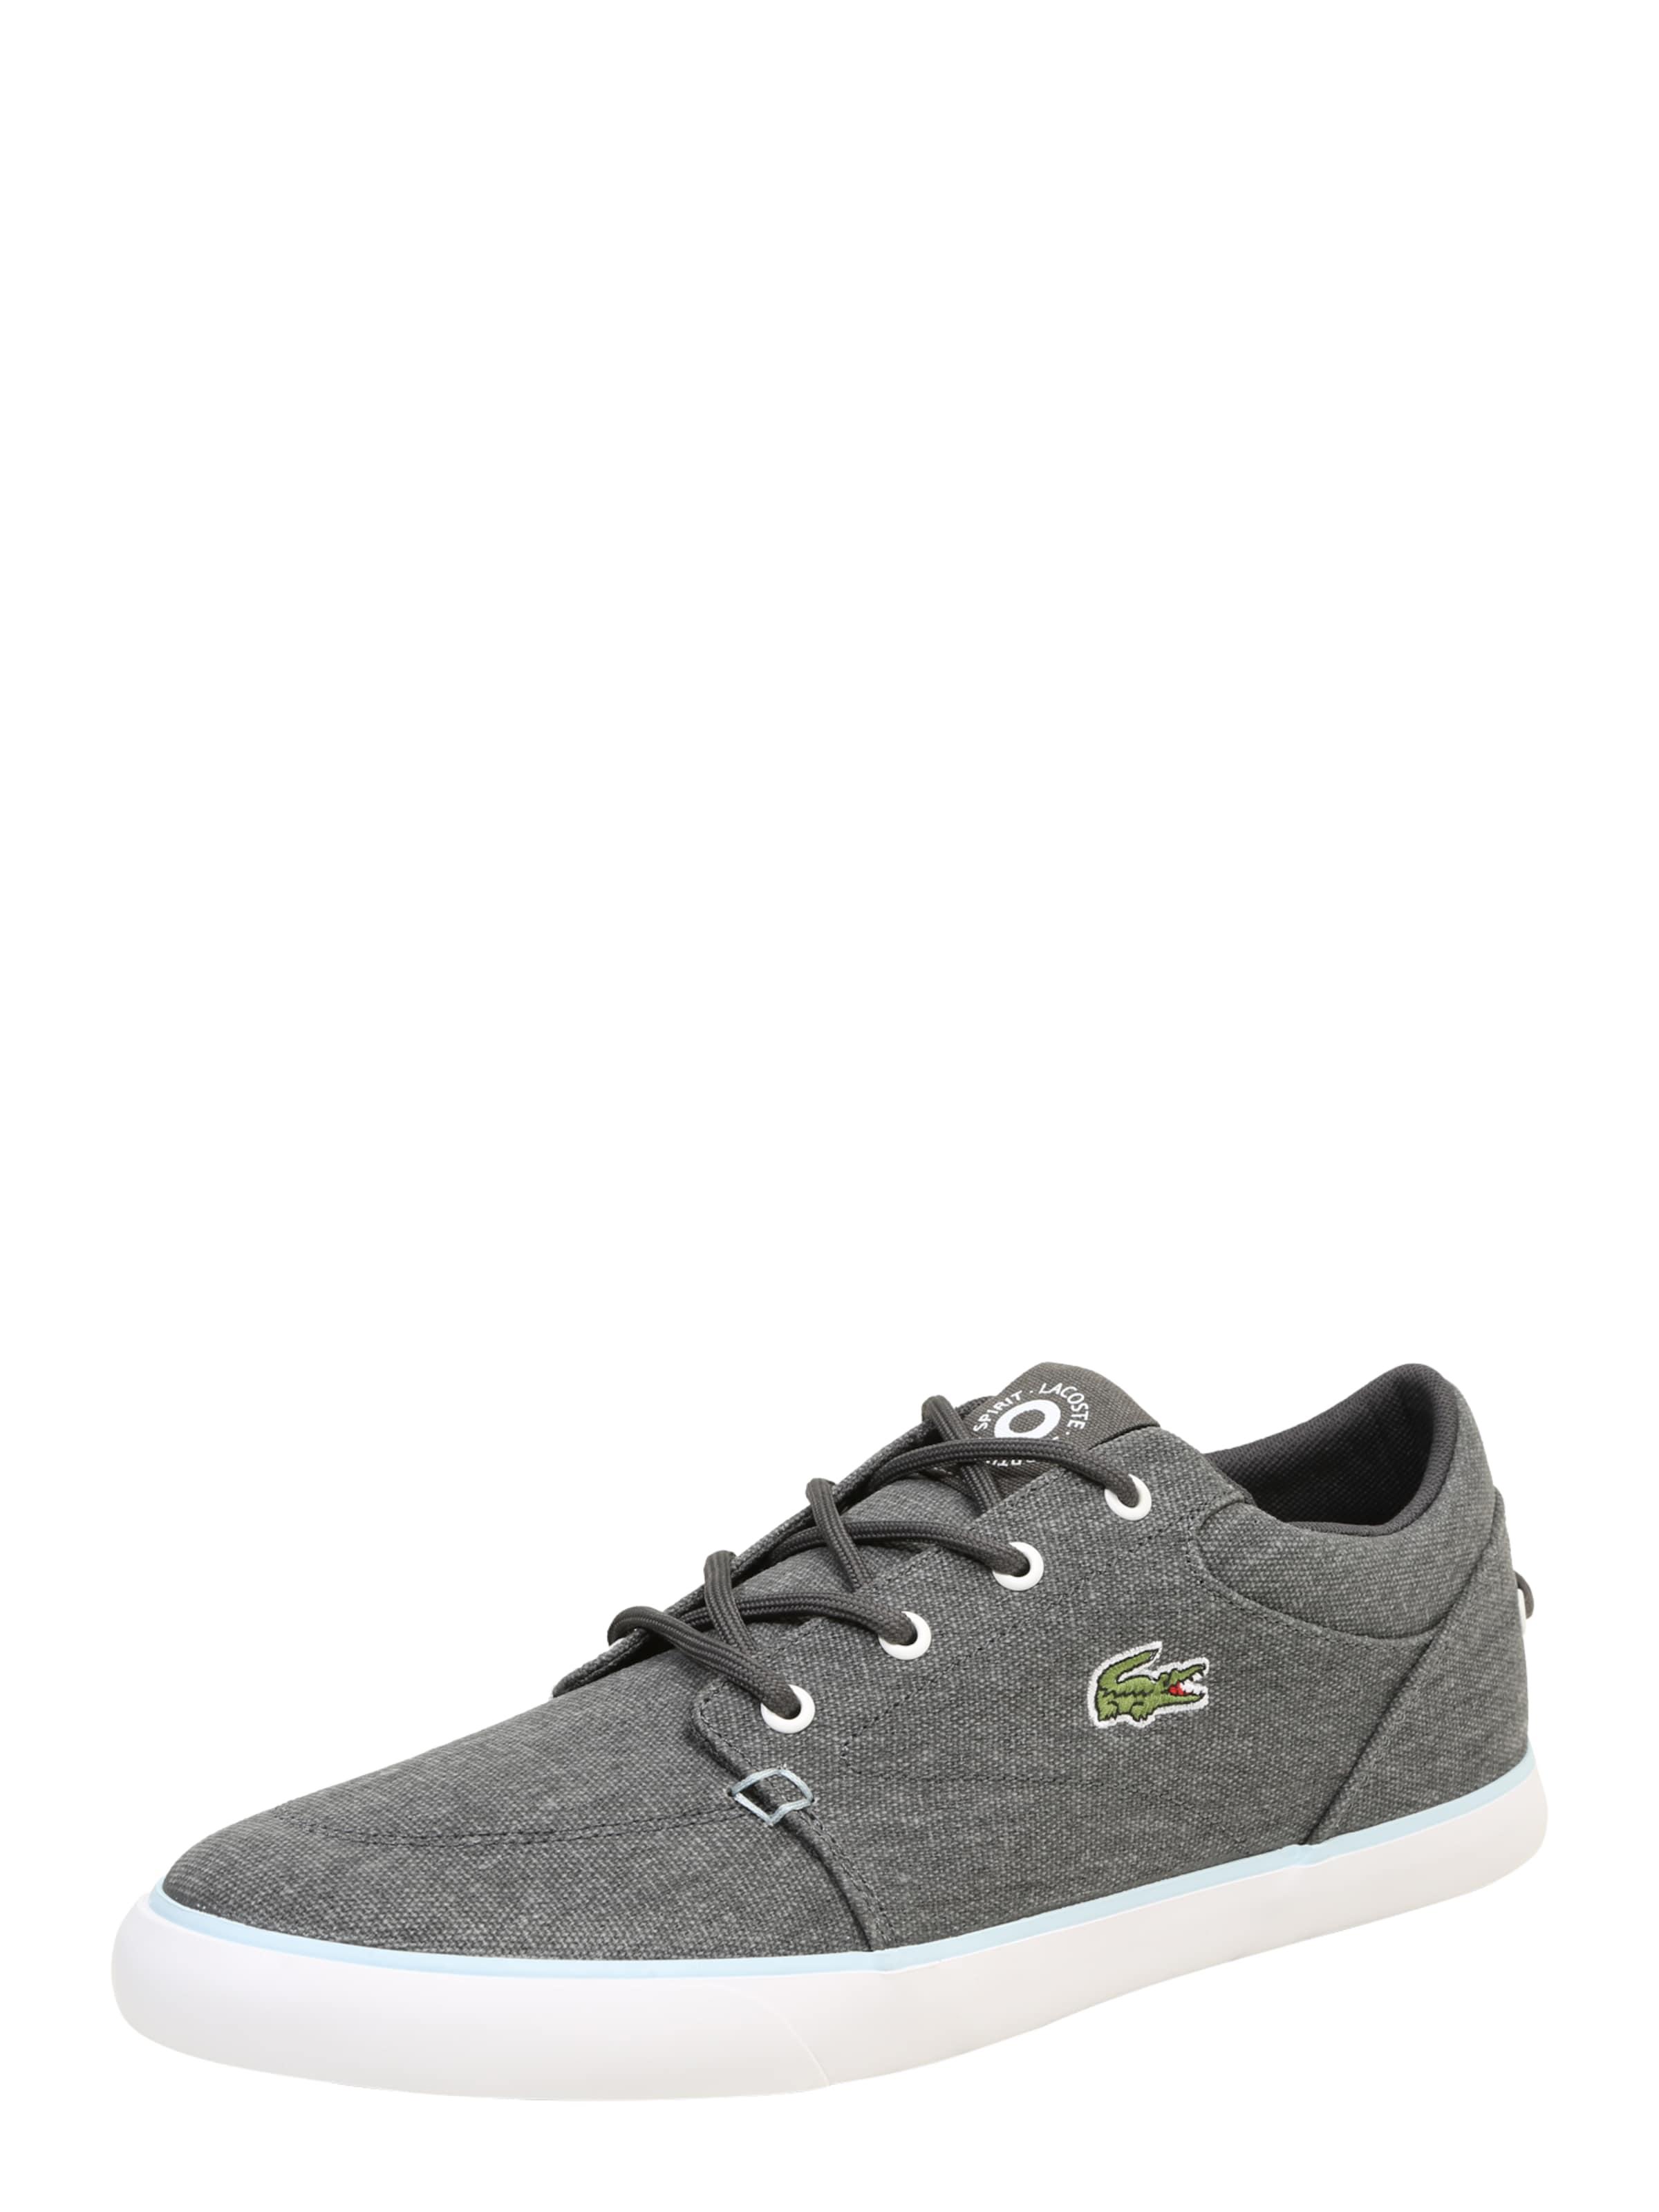 LACOSTE Sneaker BAYLISS Verschleißfeste billige Schuhe